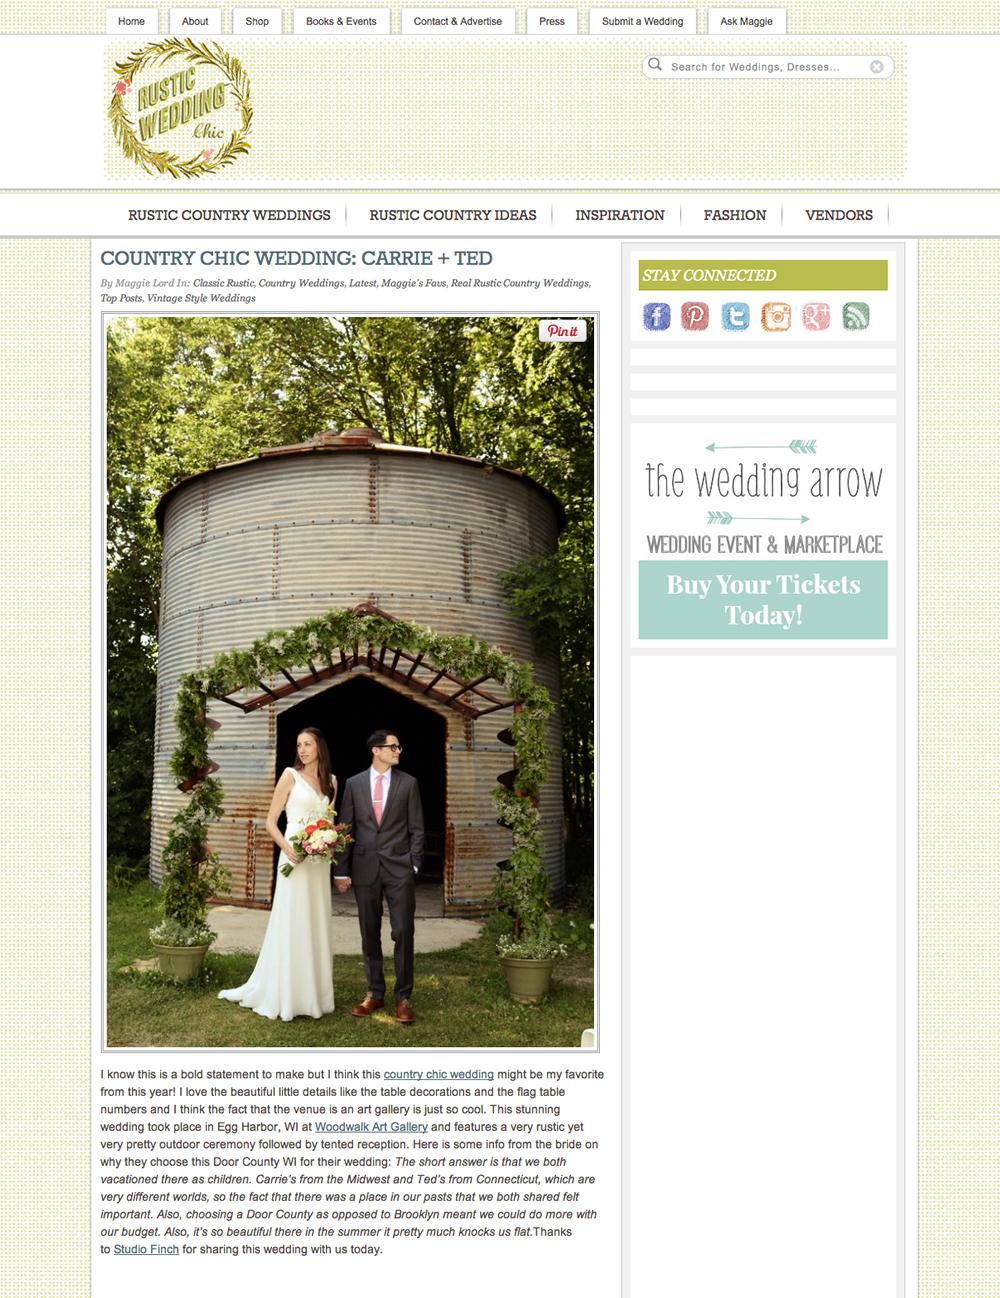 door county wedding photography featured in rustic wedding chic